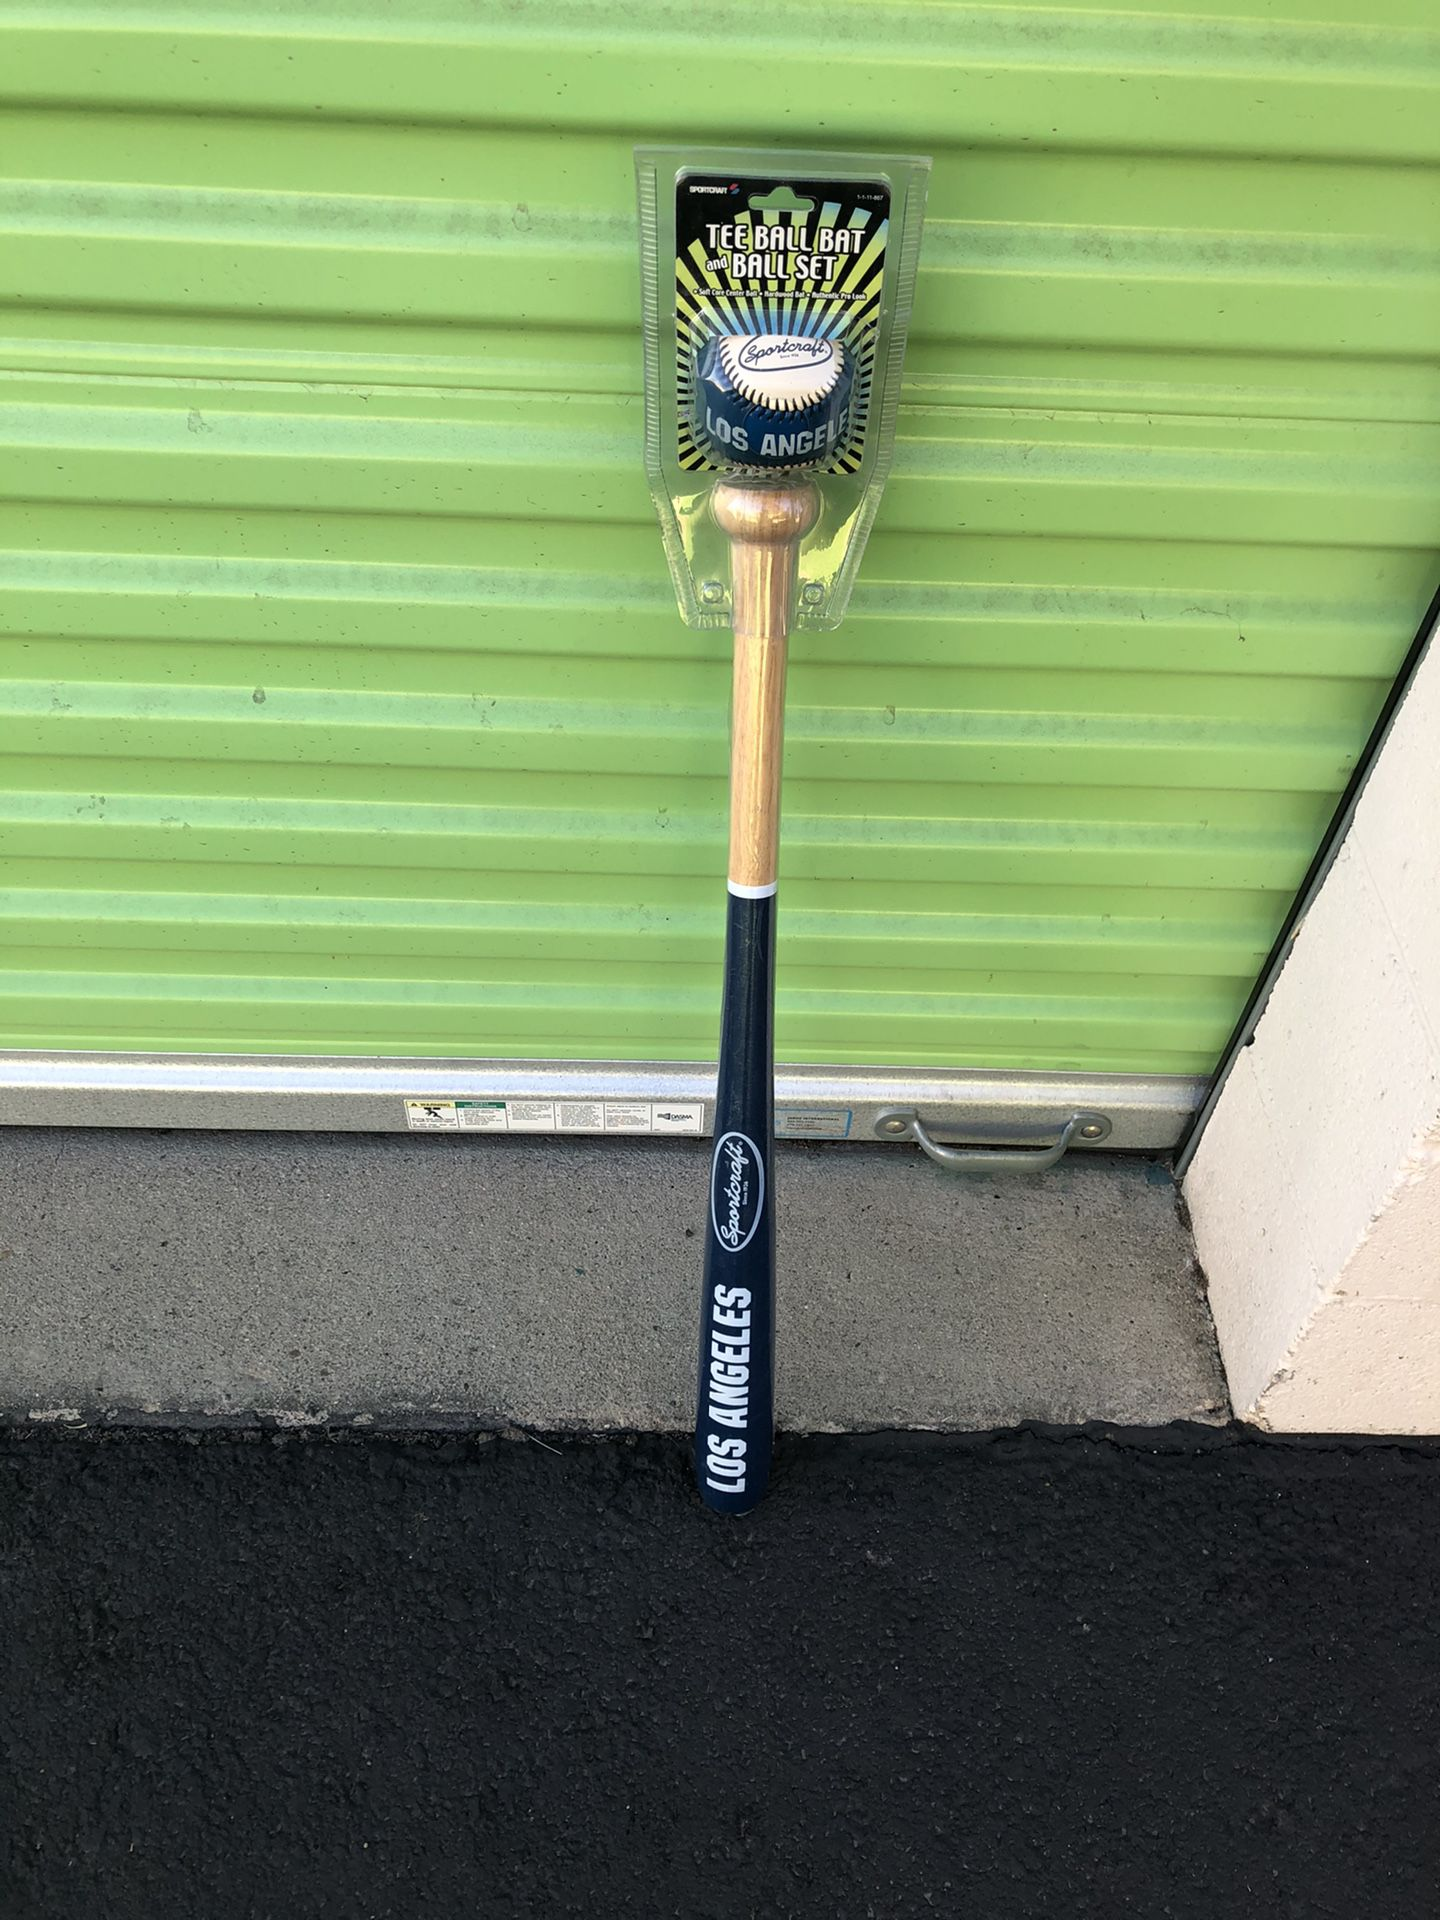 Los Angeles Dodgers Baseball & Bat